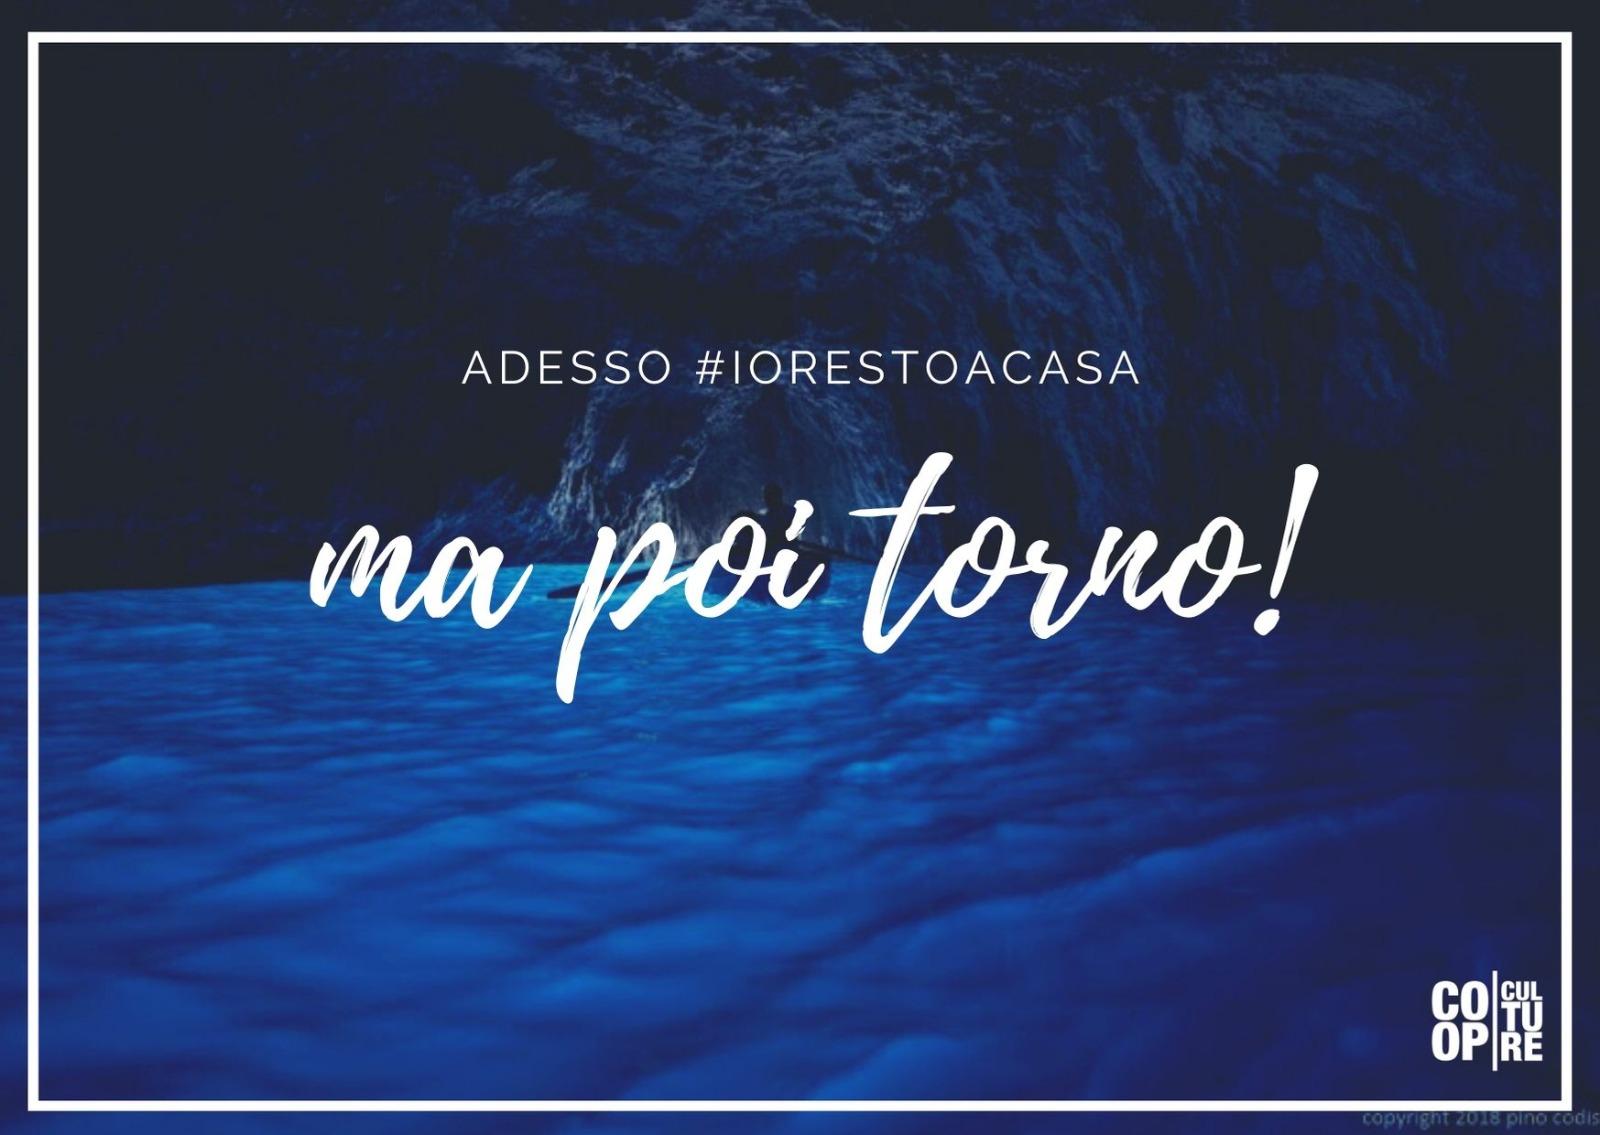 Grotta azzurra, Culture stories